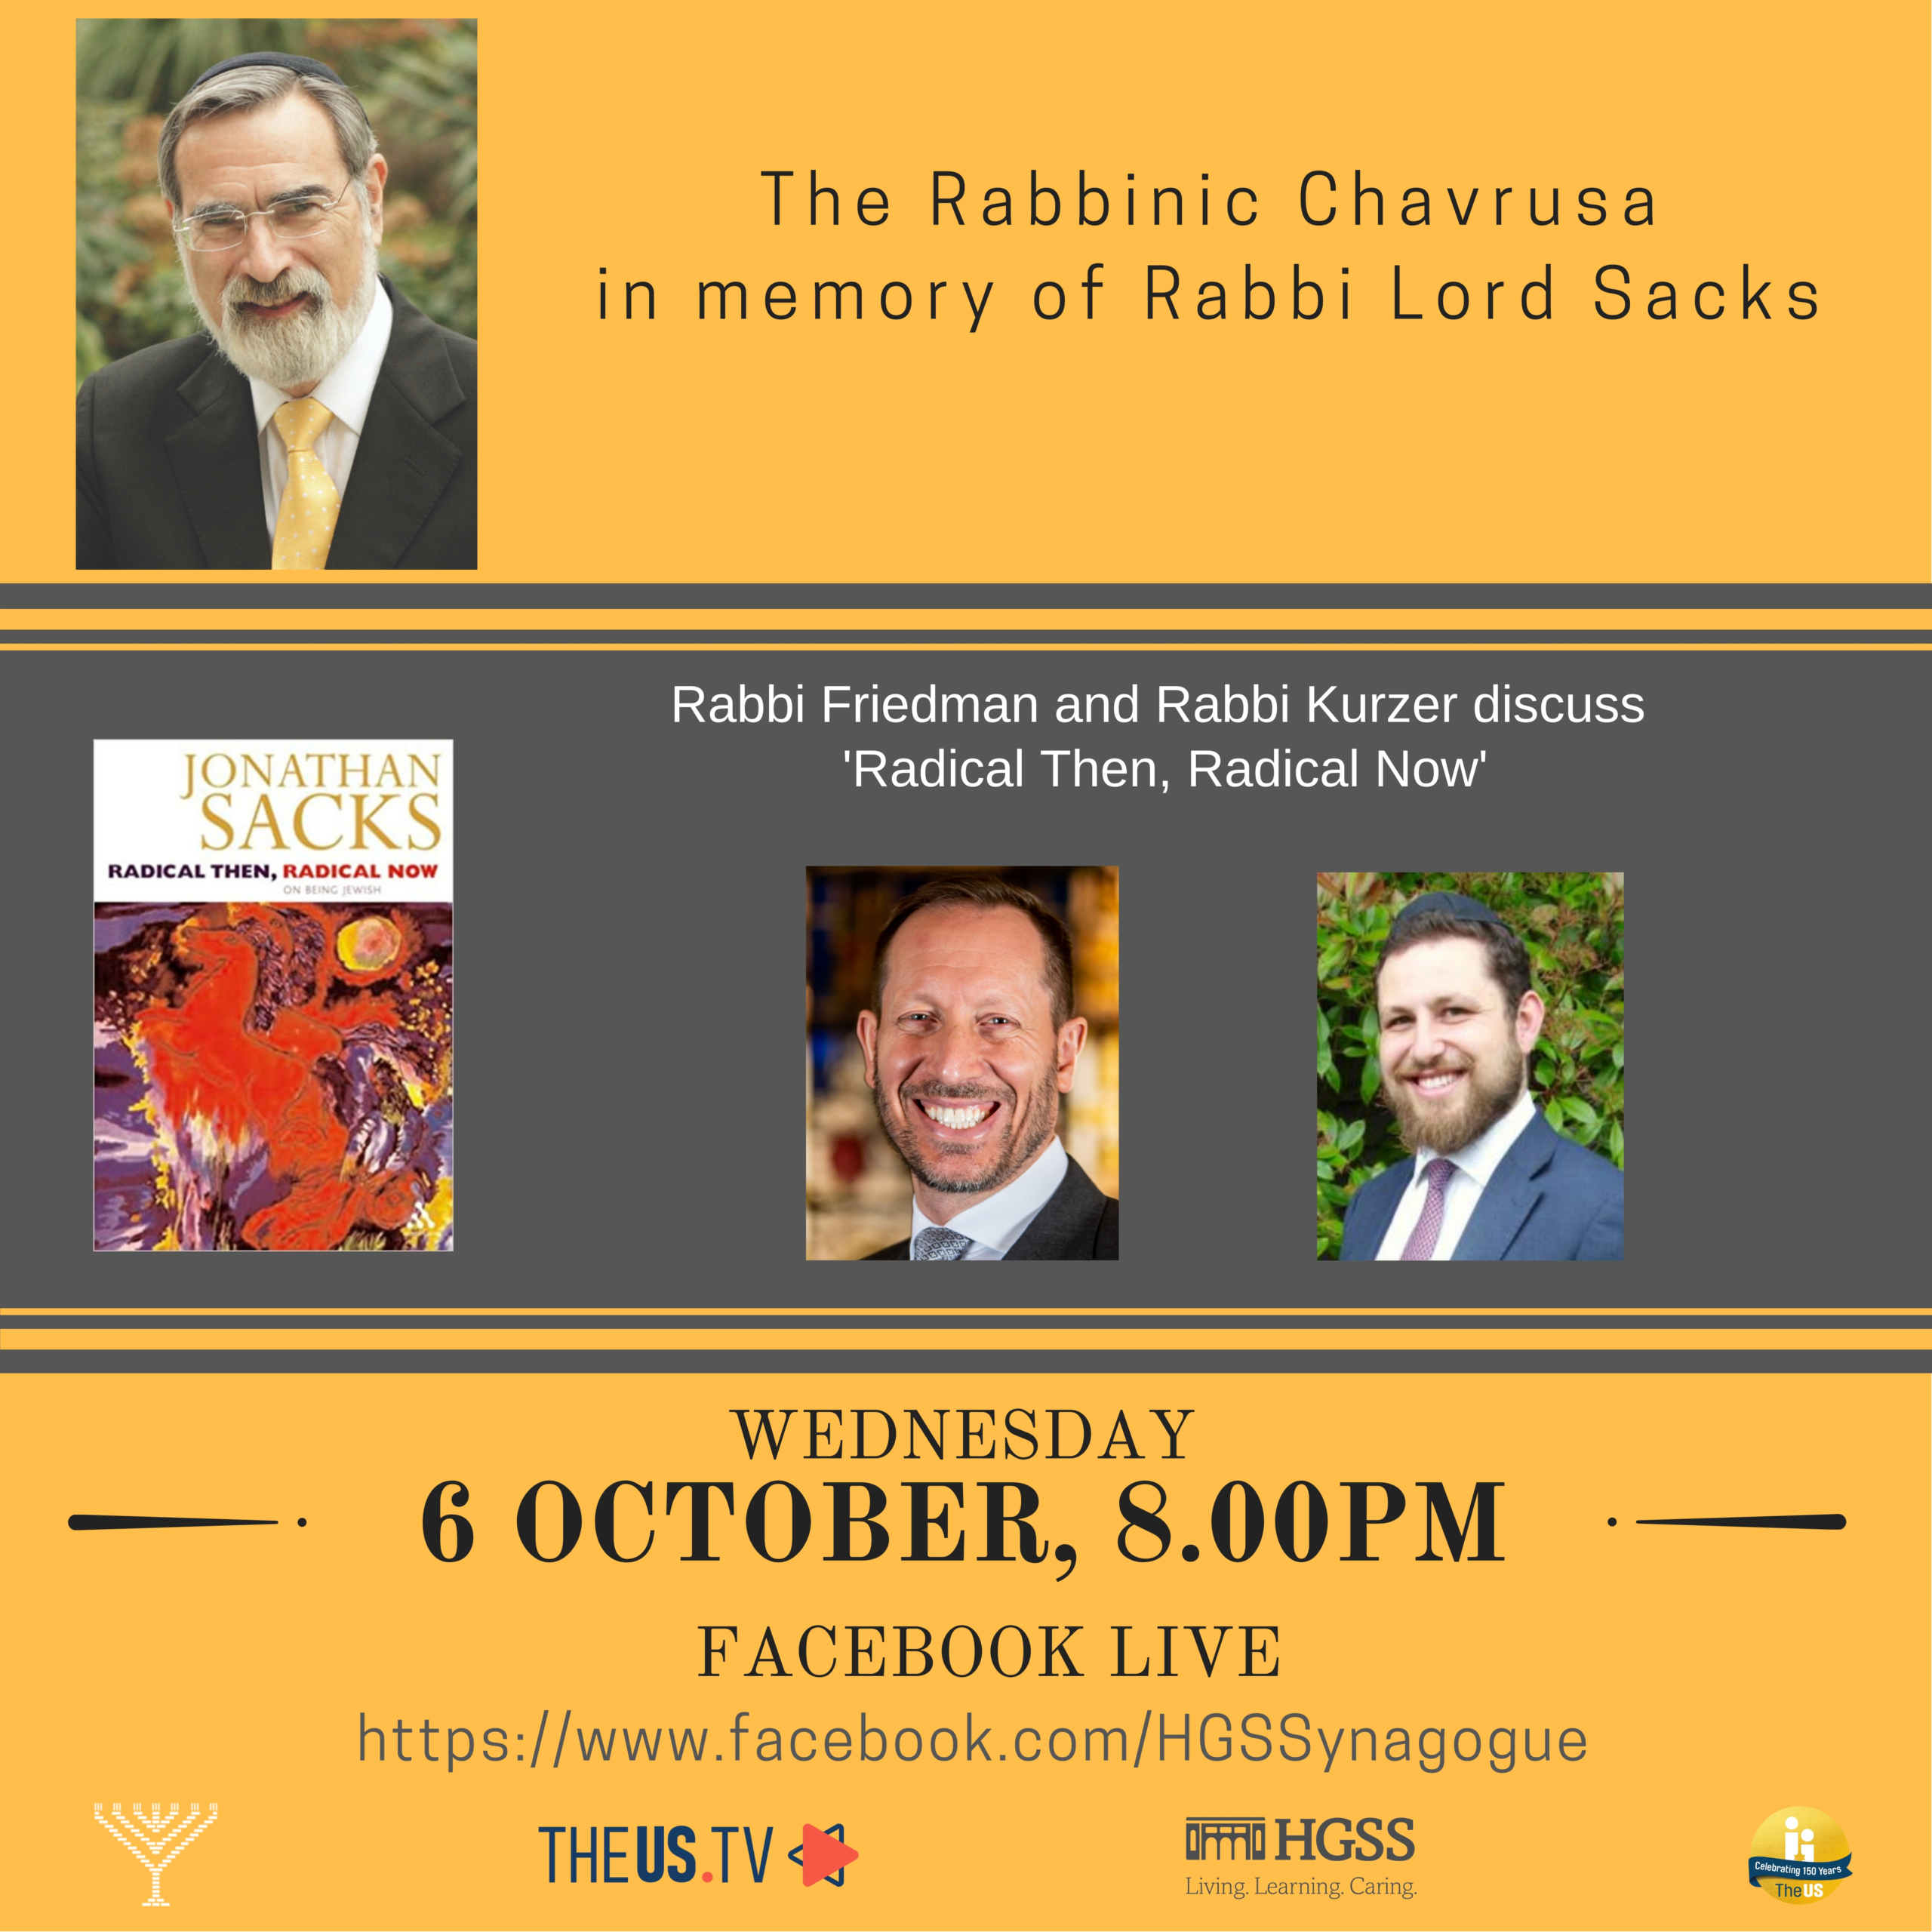 The Rabbinic Chavrusa @ Facebook Live